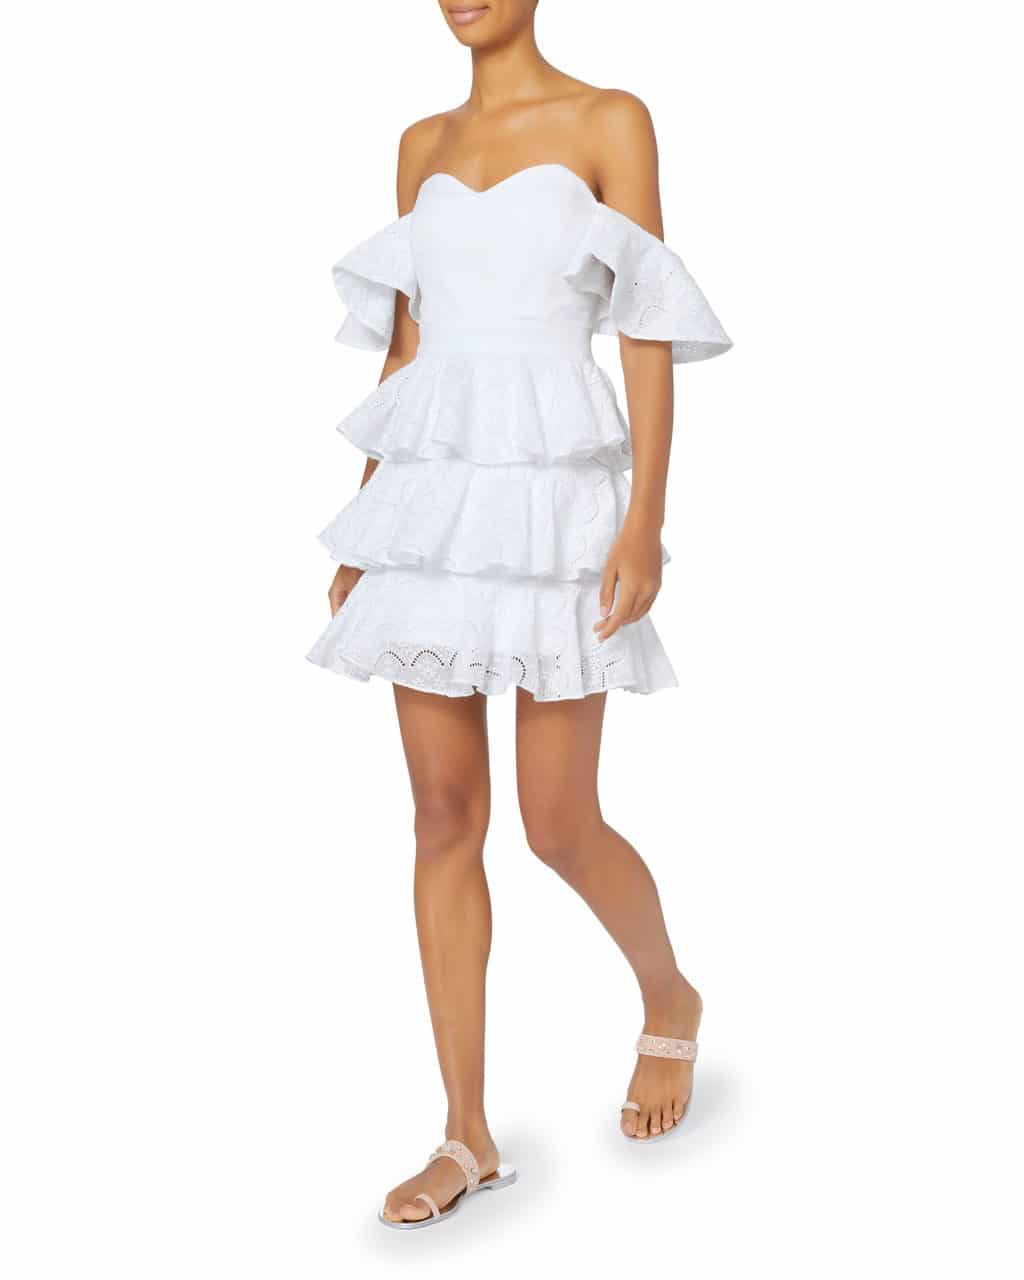 c426acdb953b CAROLINE CONSTAS Irene Mini Ruffle White Dress - We Select Dresses